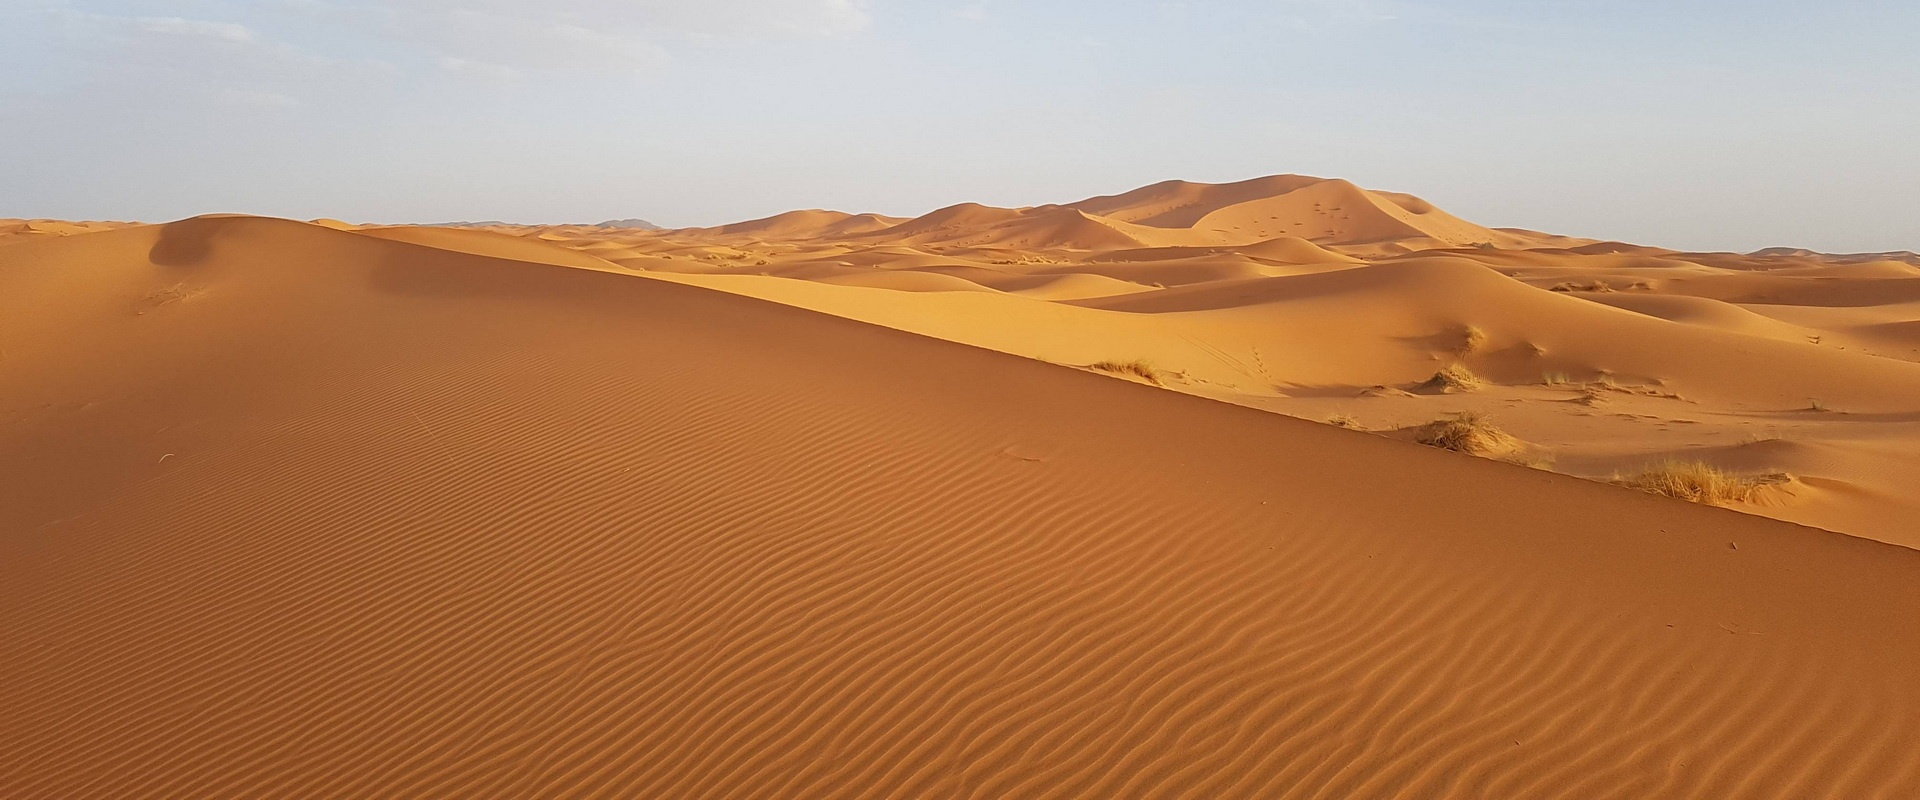 Voyages Expeditions Maroc - dunes et desert marocain